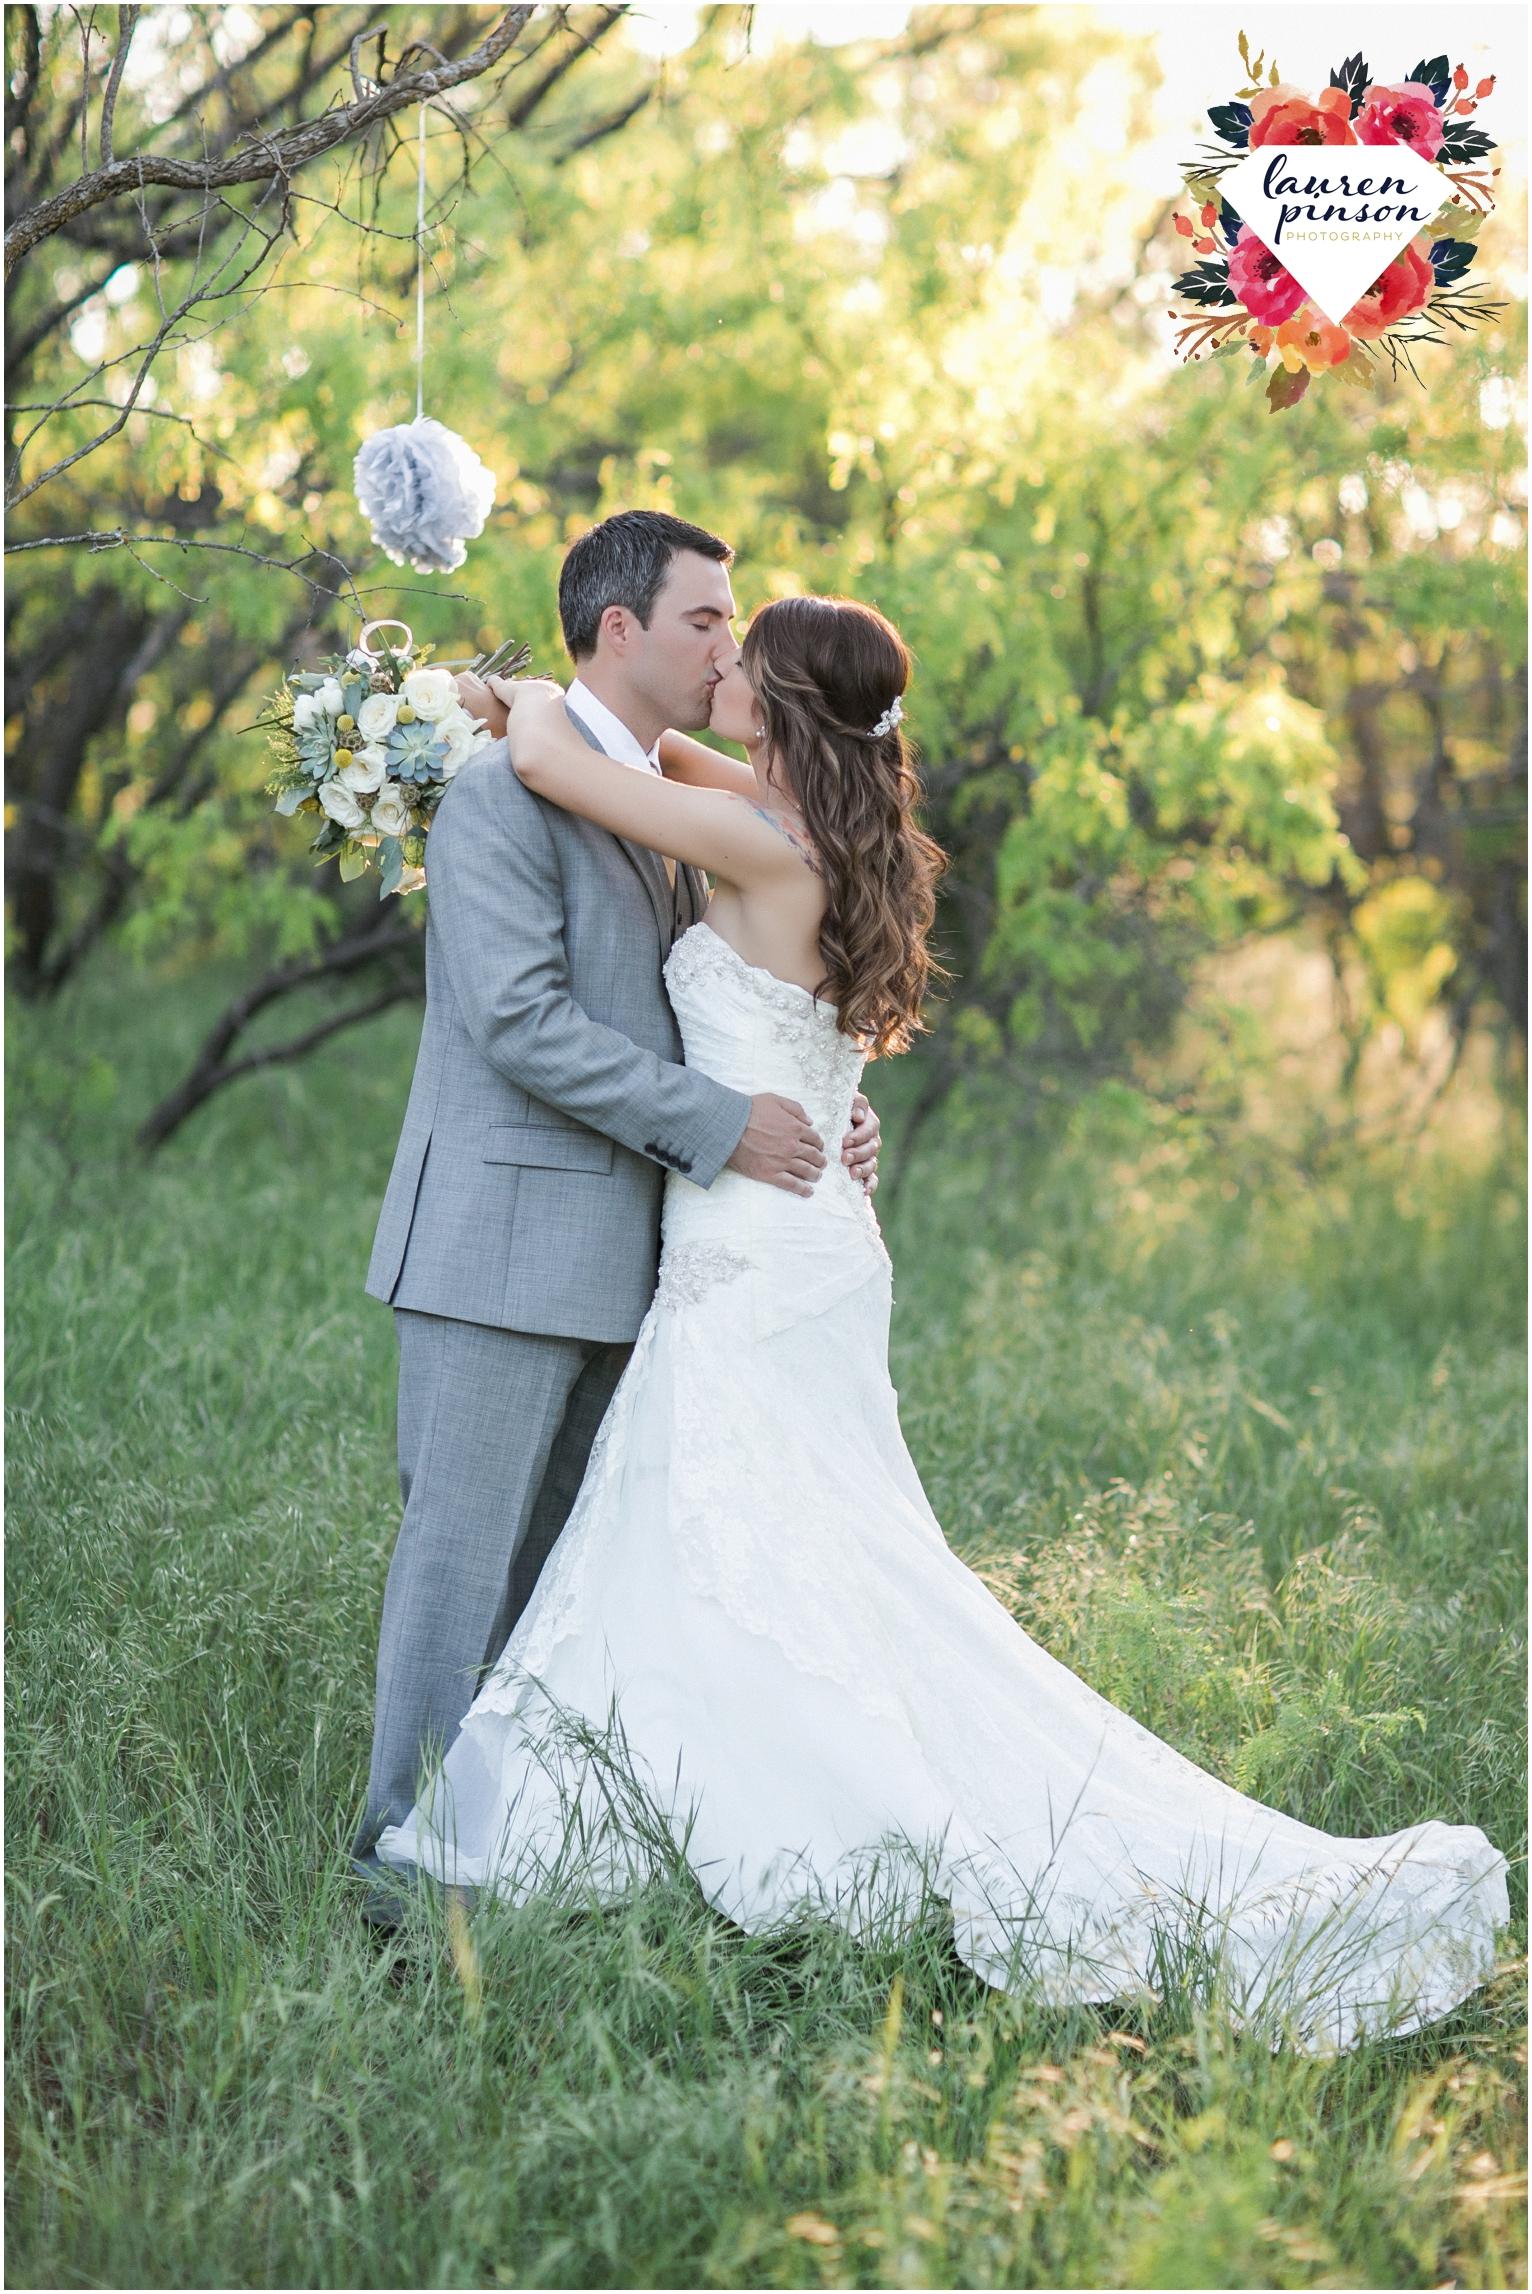 wichita-falls-wedding-photographer-oklahoma-wichita-mountains-bridal-session-bridals-photography_0760.jpg